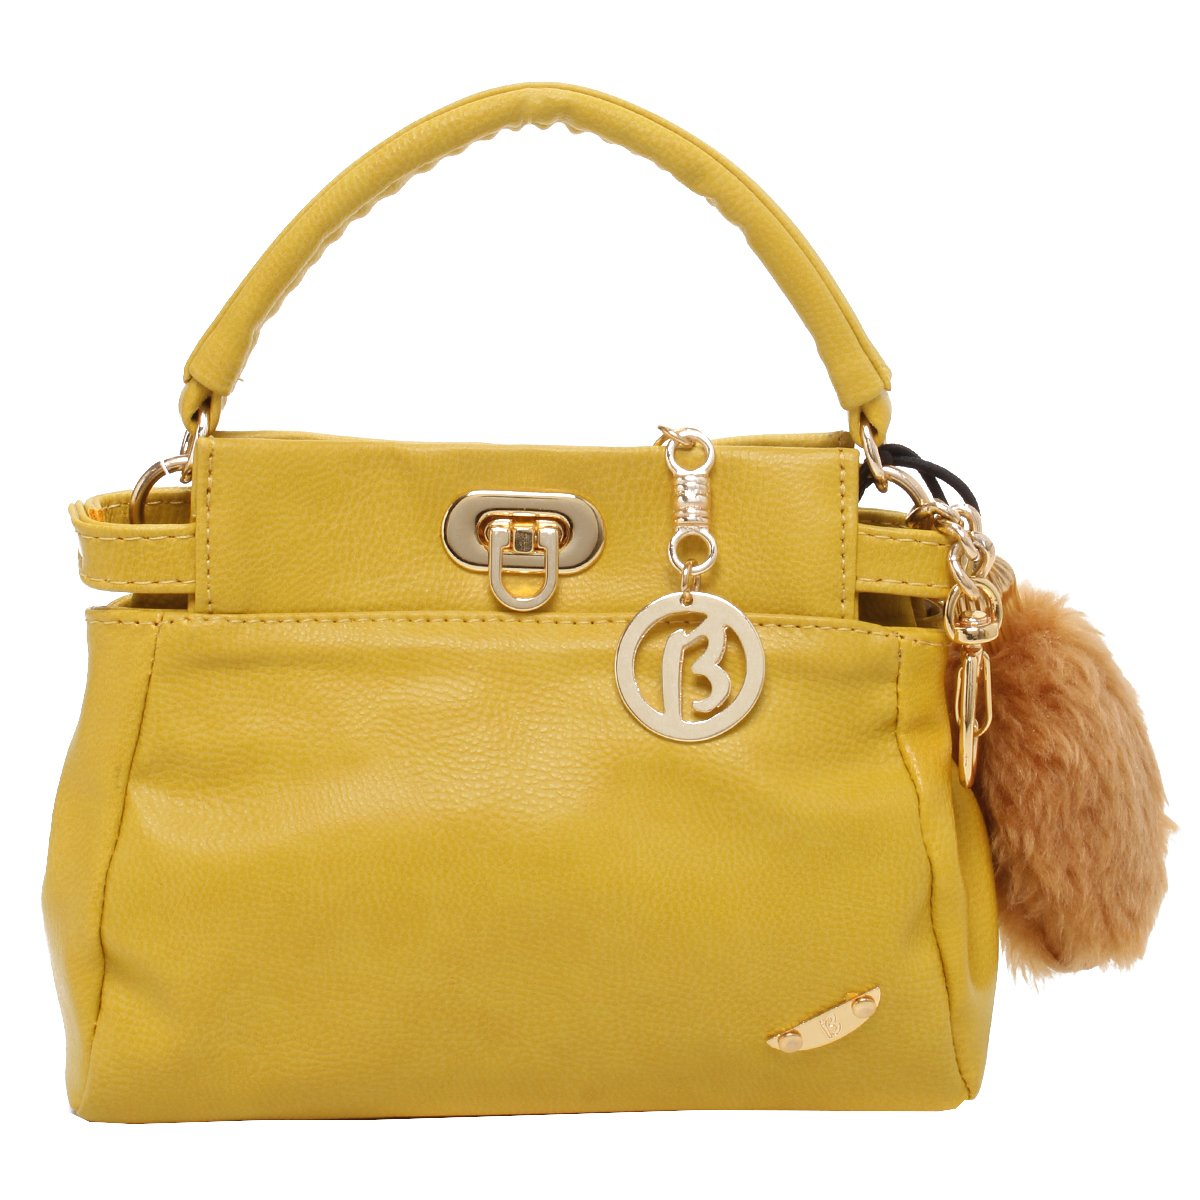 8633afa607d32 Bolsa Birô Mini Bag Sabrina Sato - Compre Agora